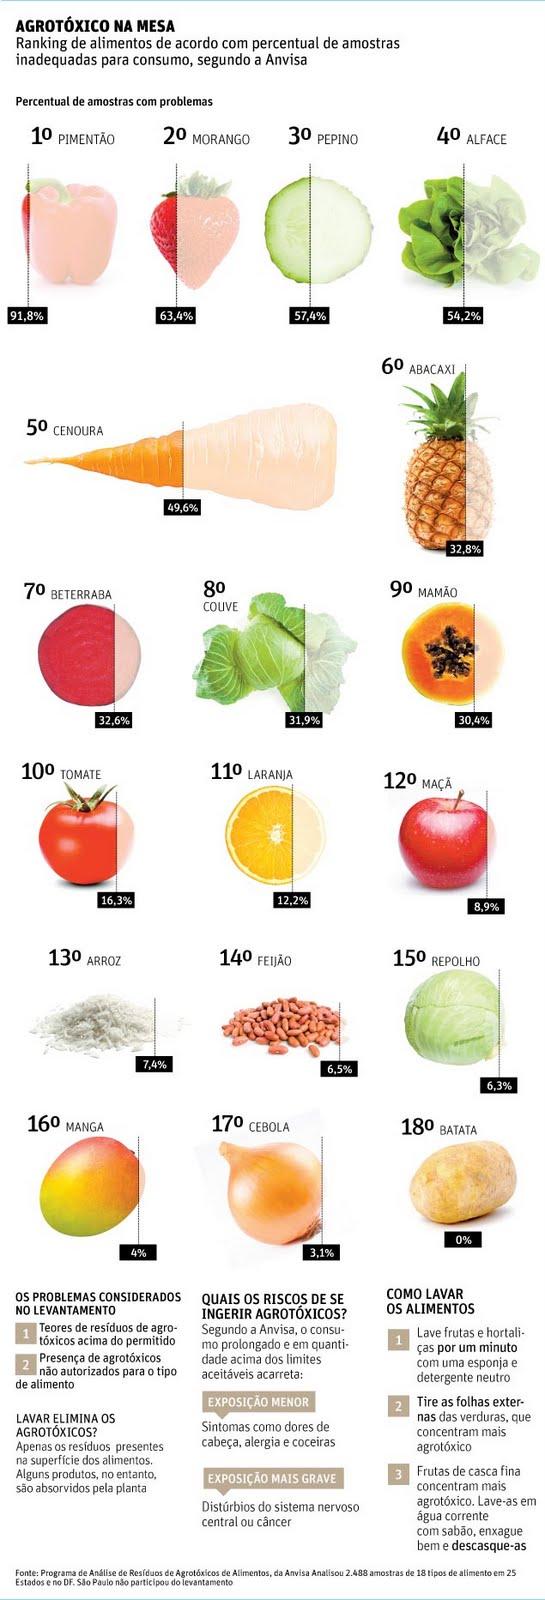 alimentos com agrotoxicos